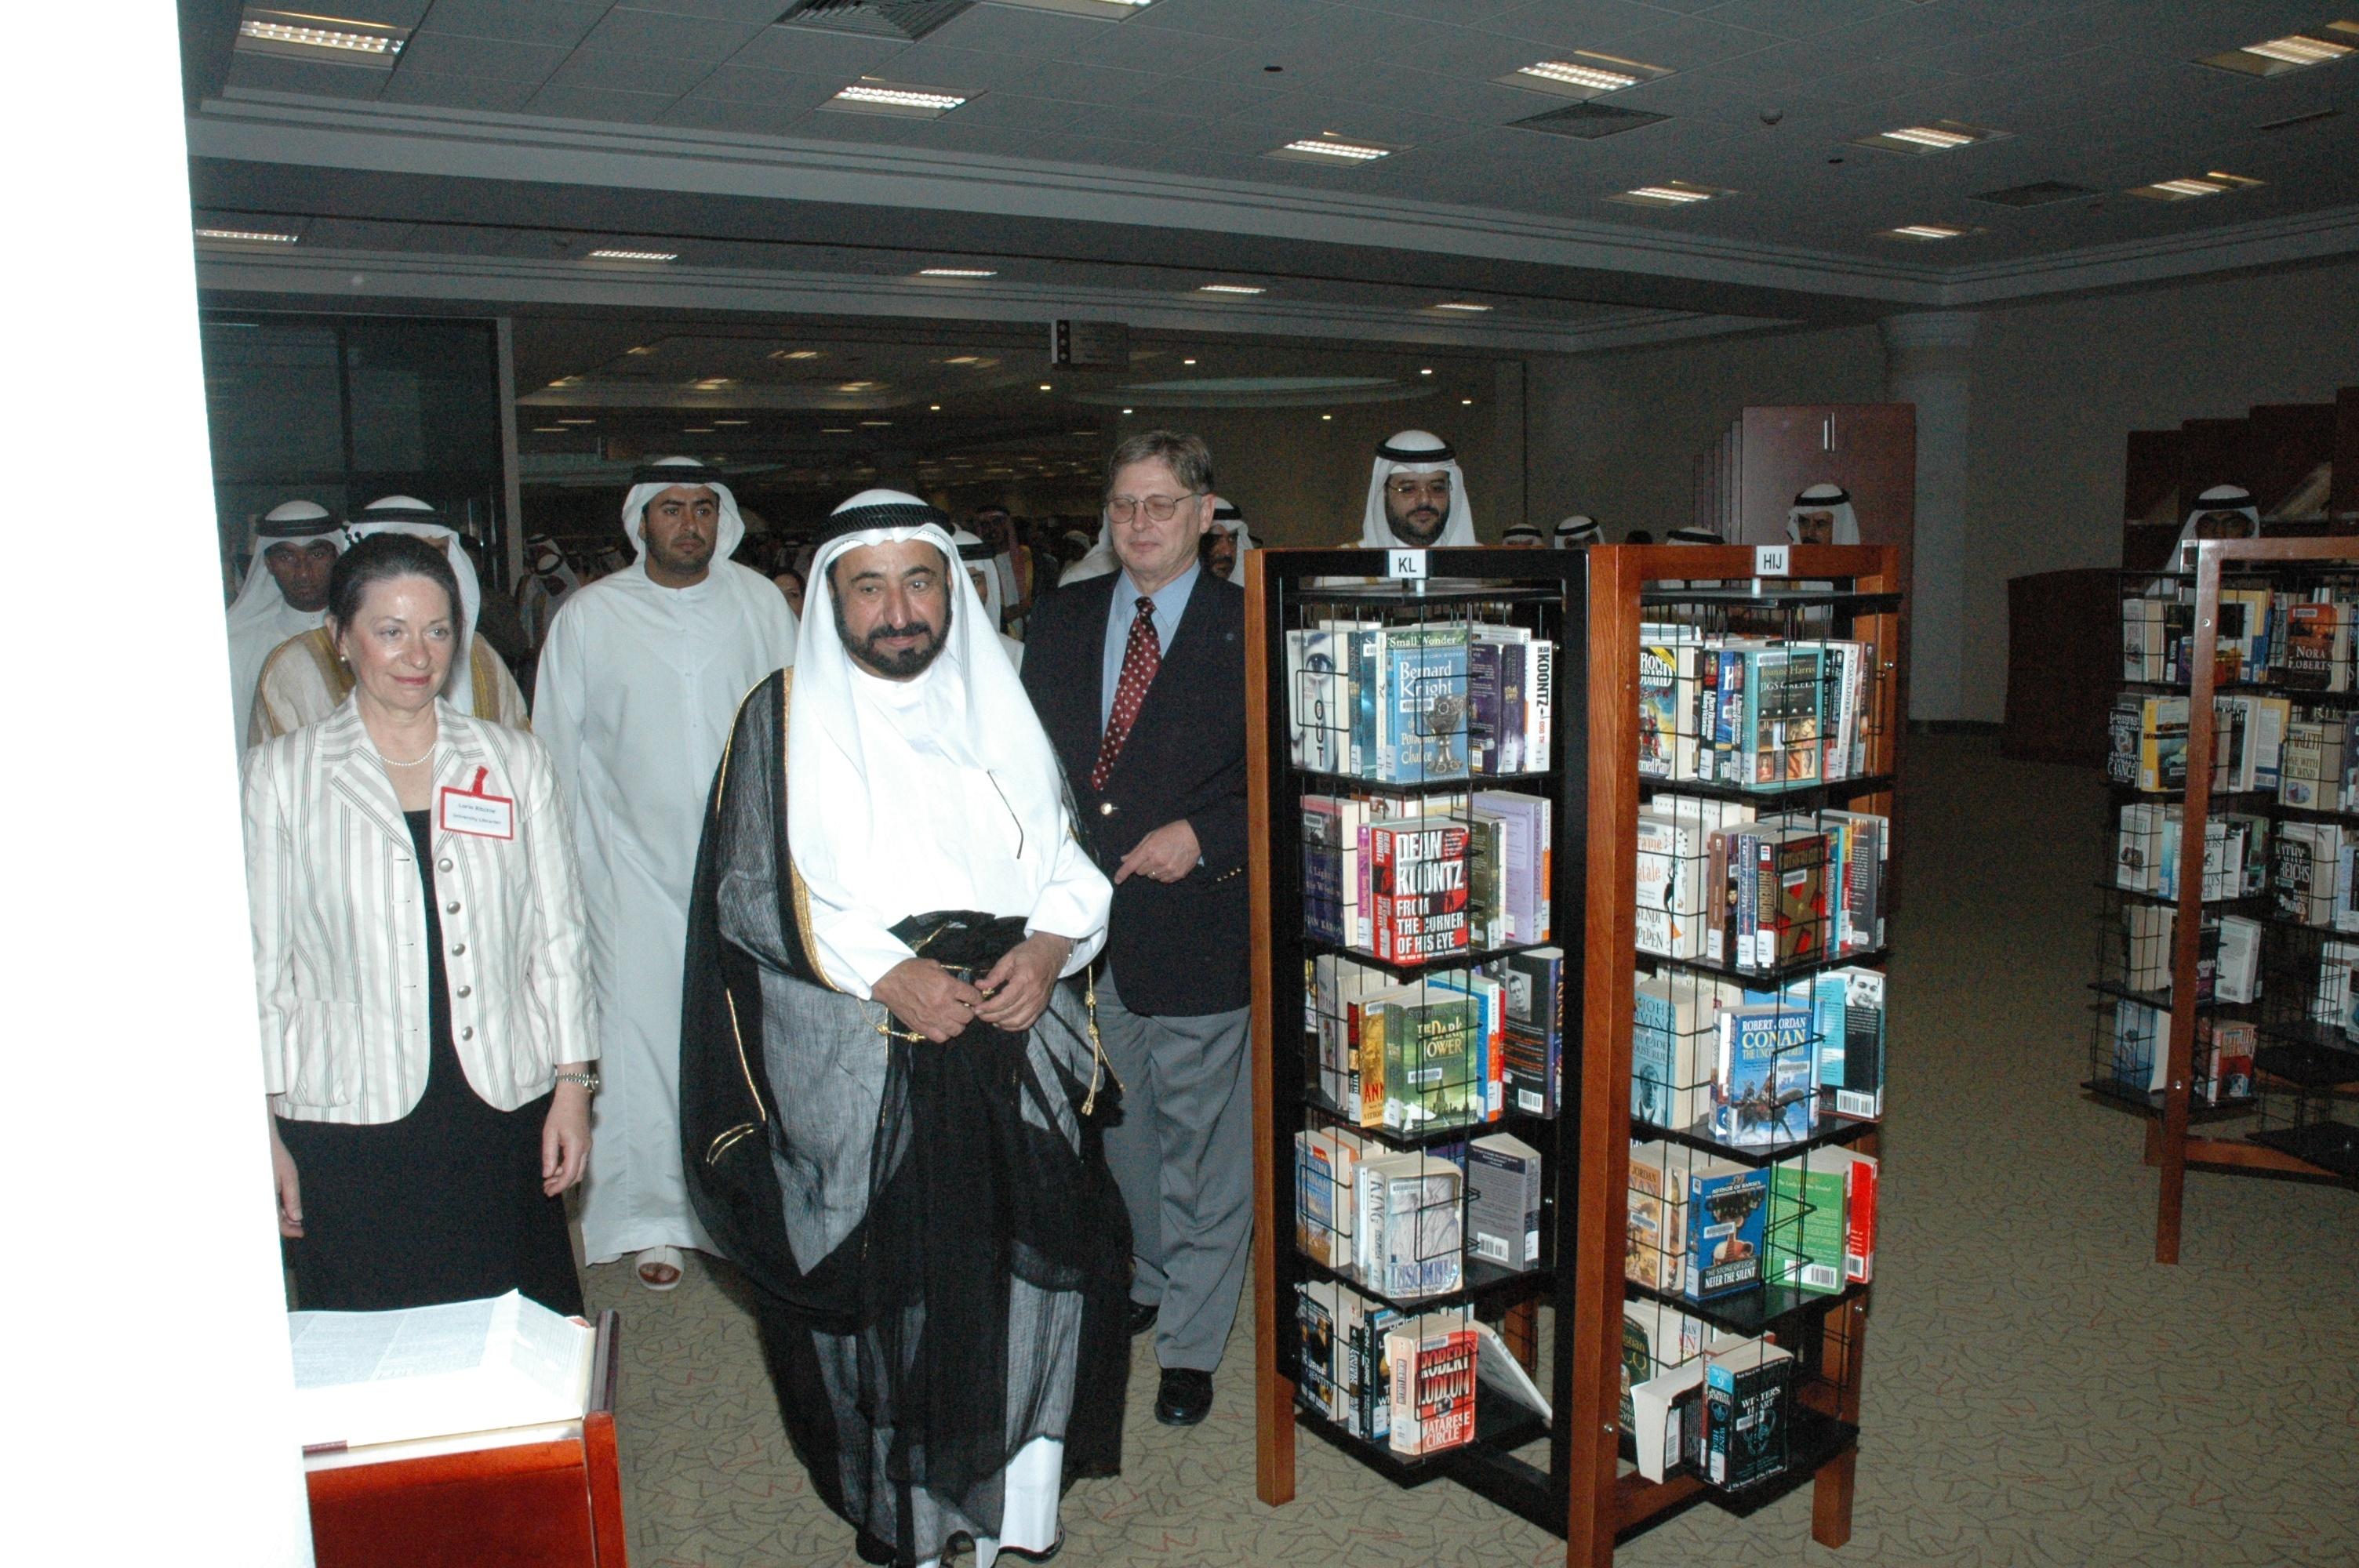 American_University_of_Sharjah_Library_12.jpg